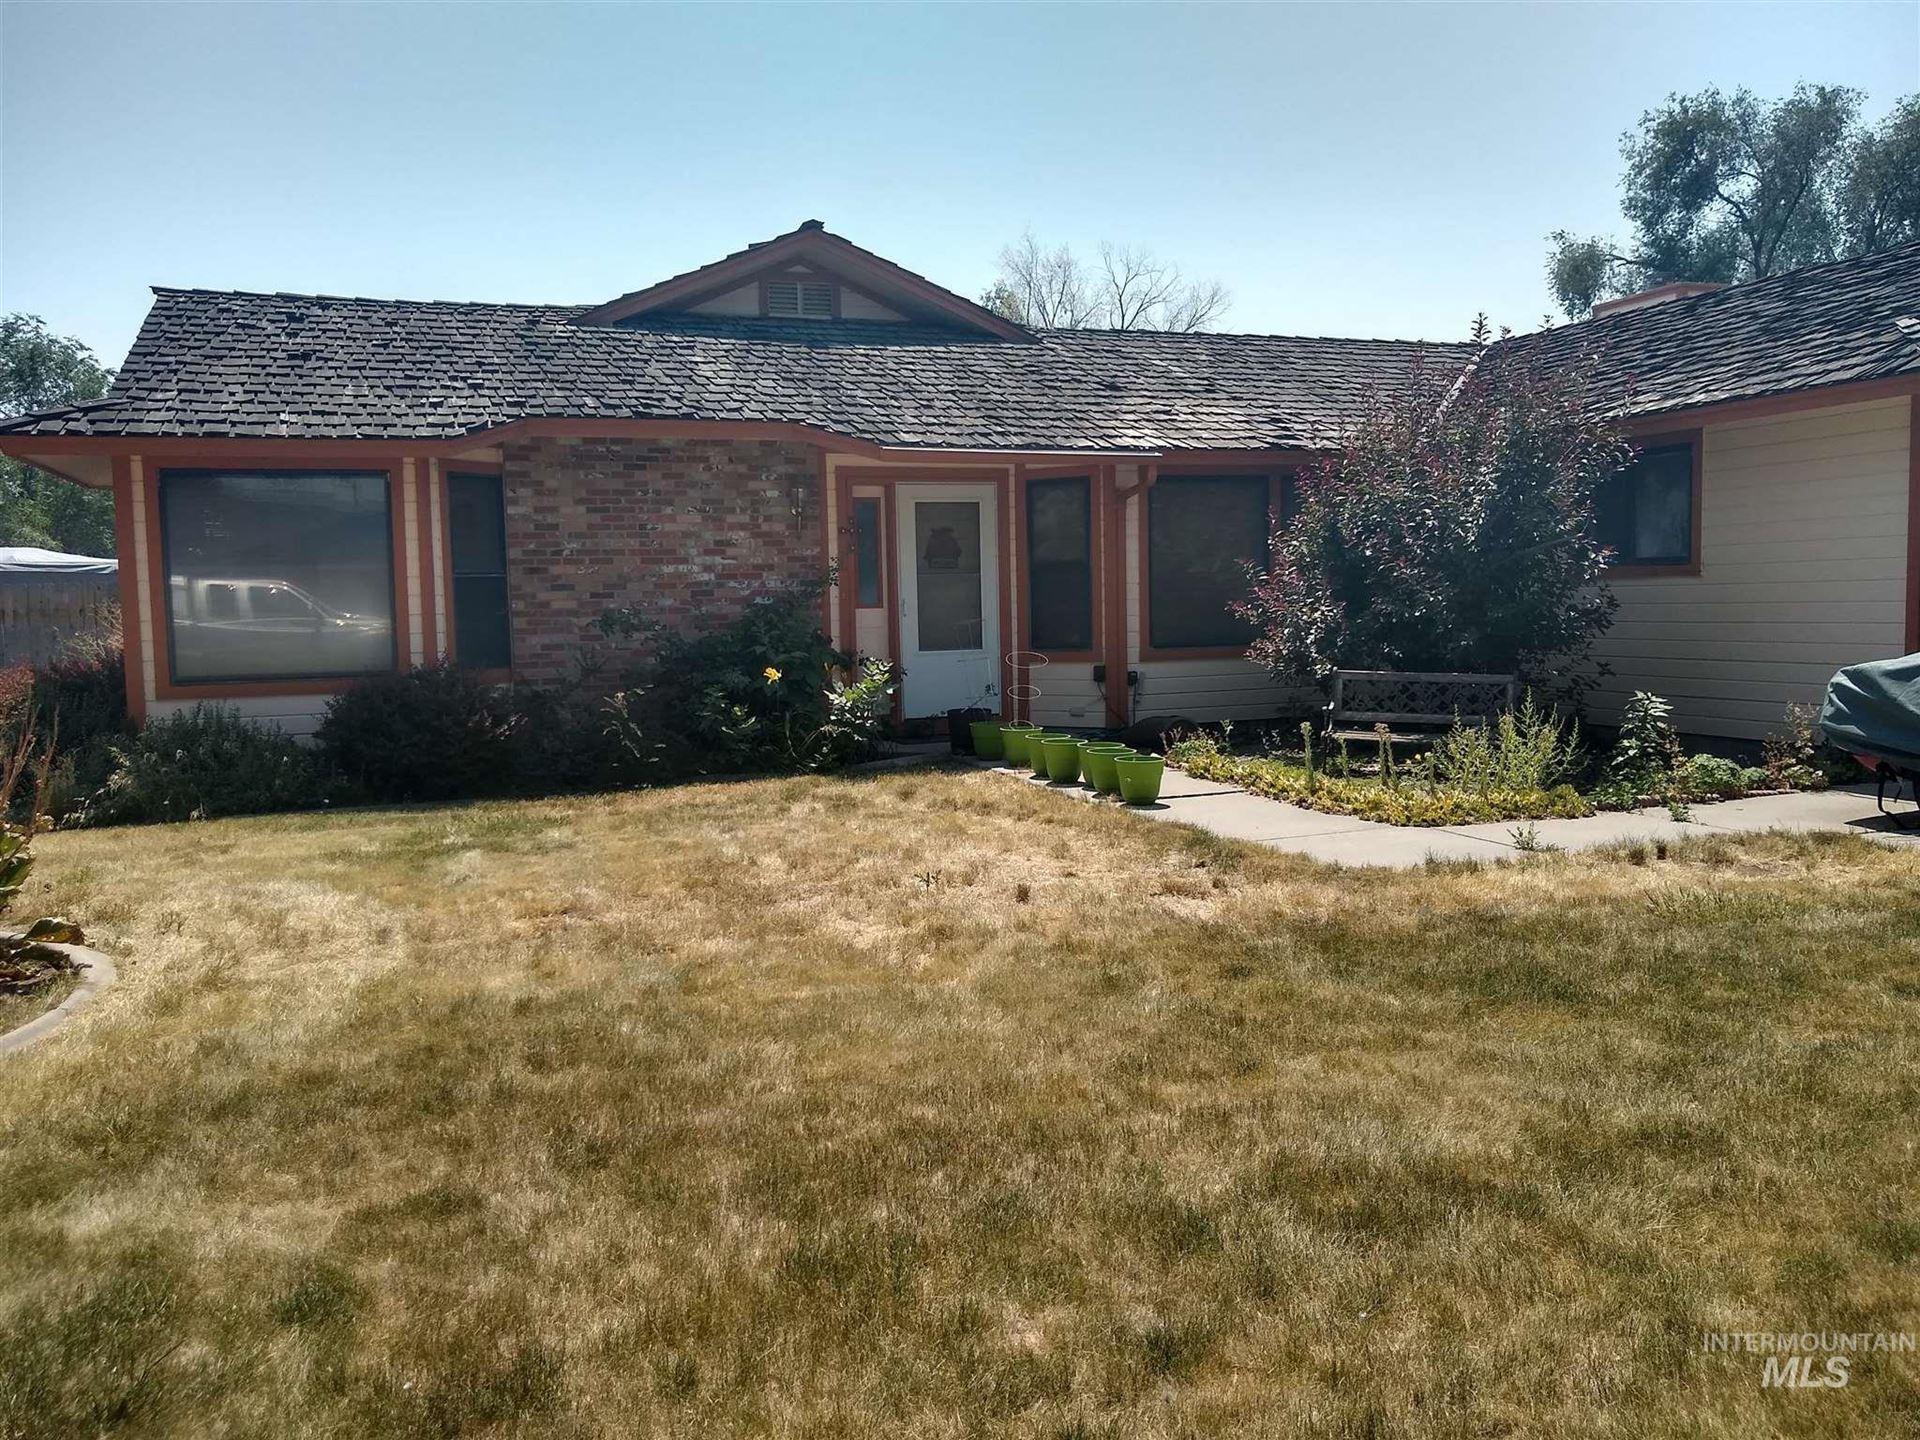 1304 N 6th East, Mountain Home, ID 83647 - MLS#: 98812254